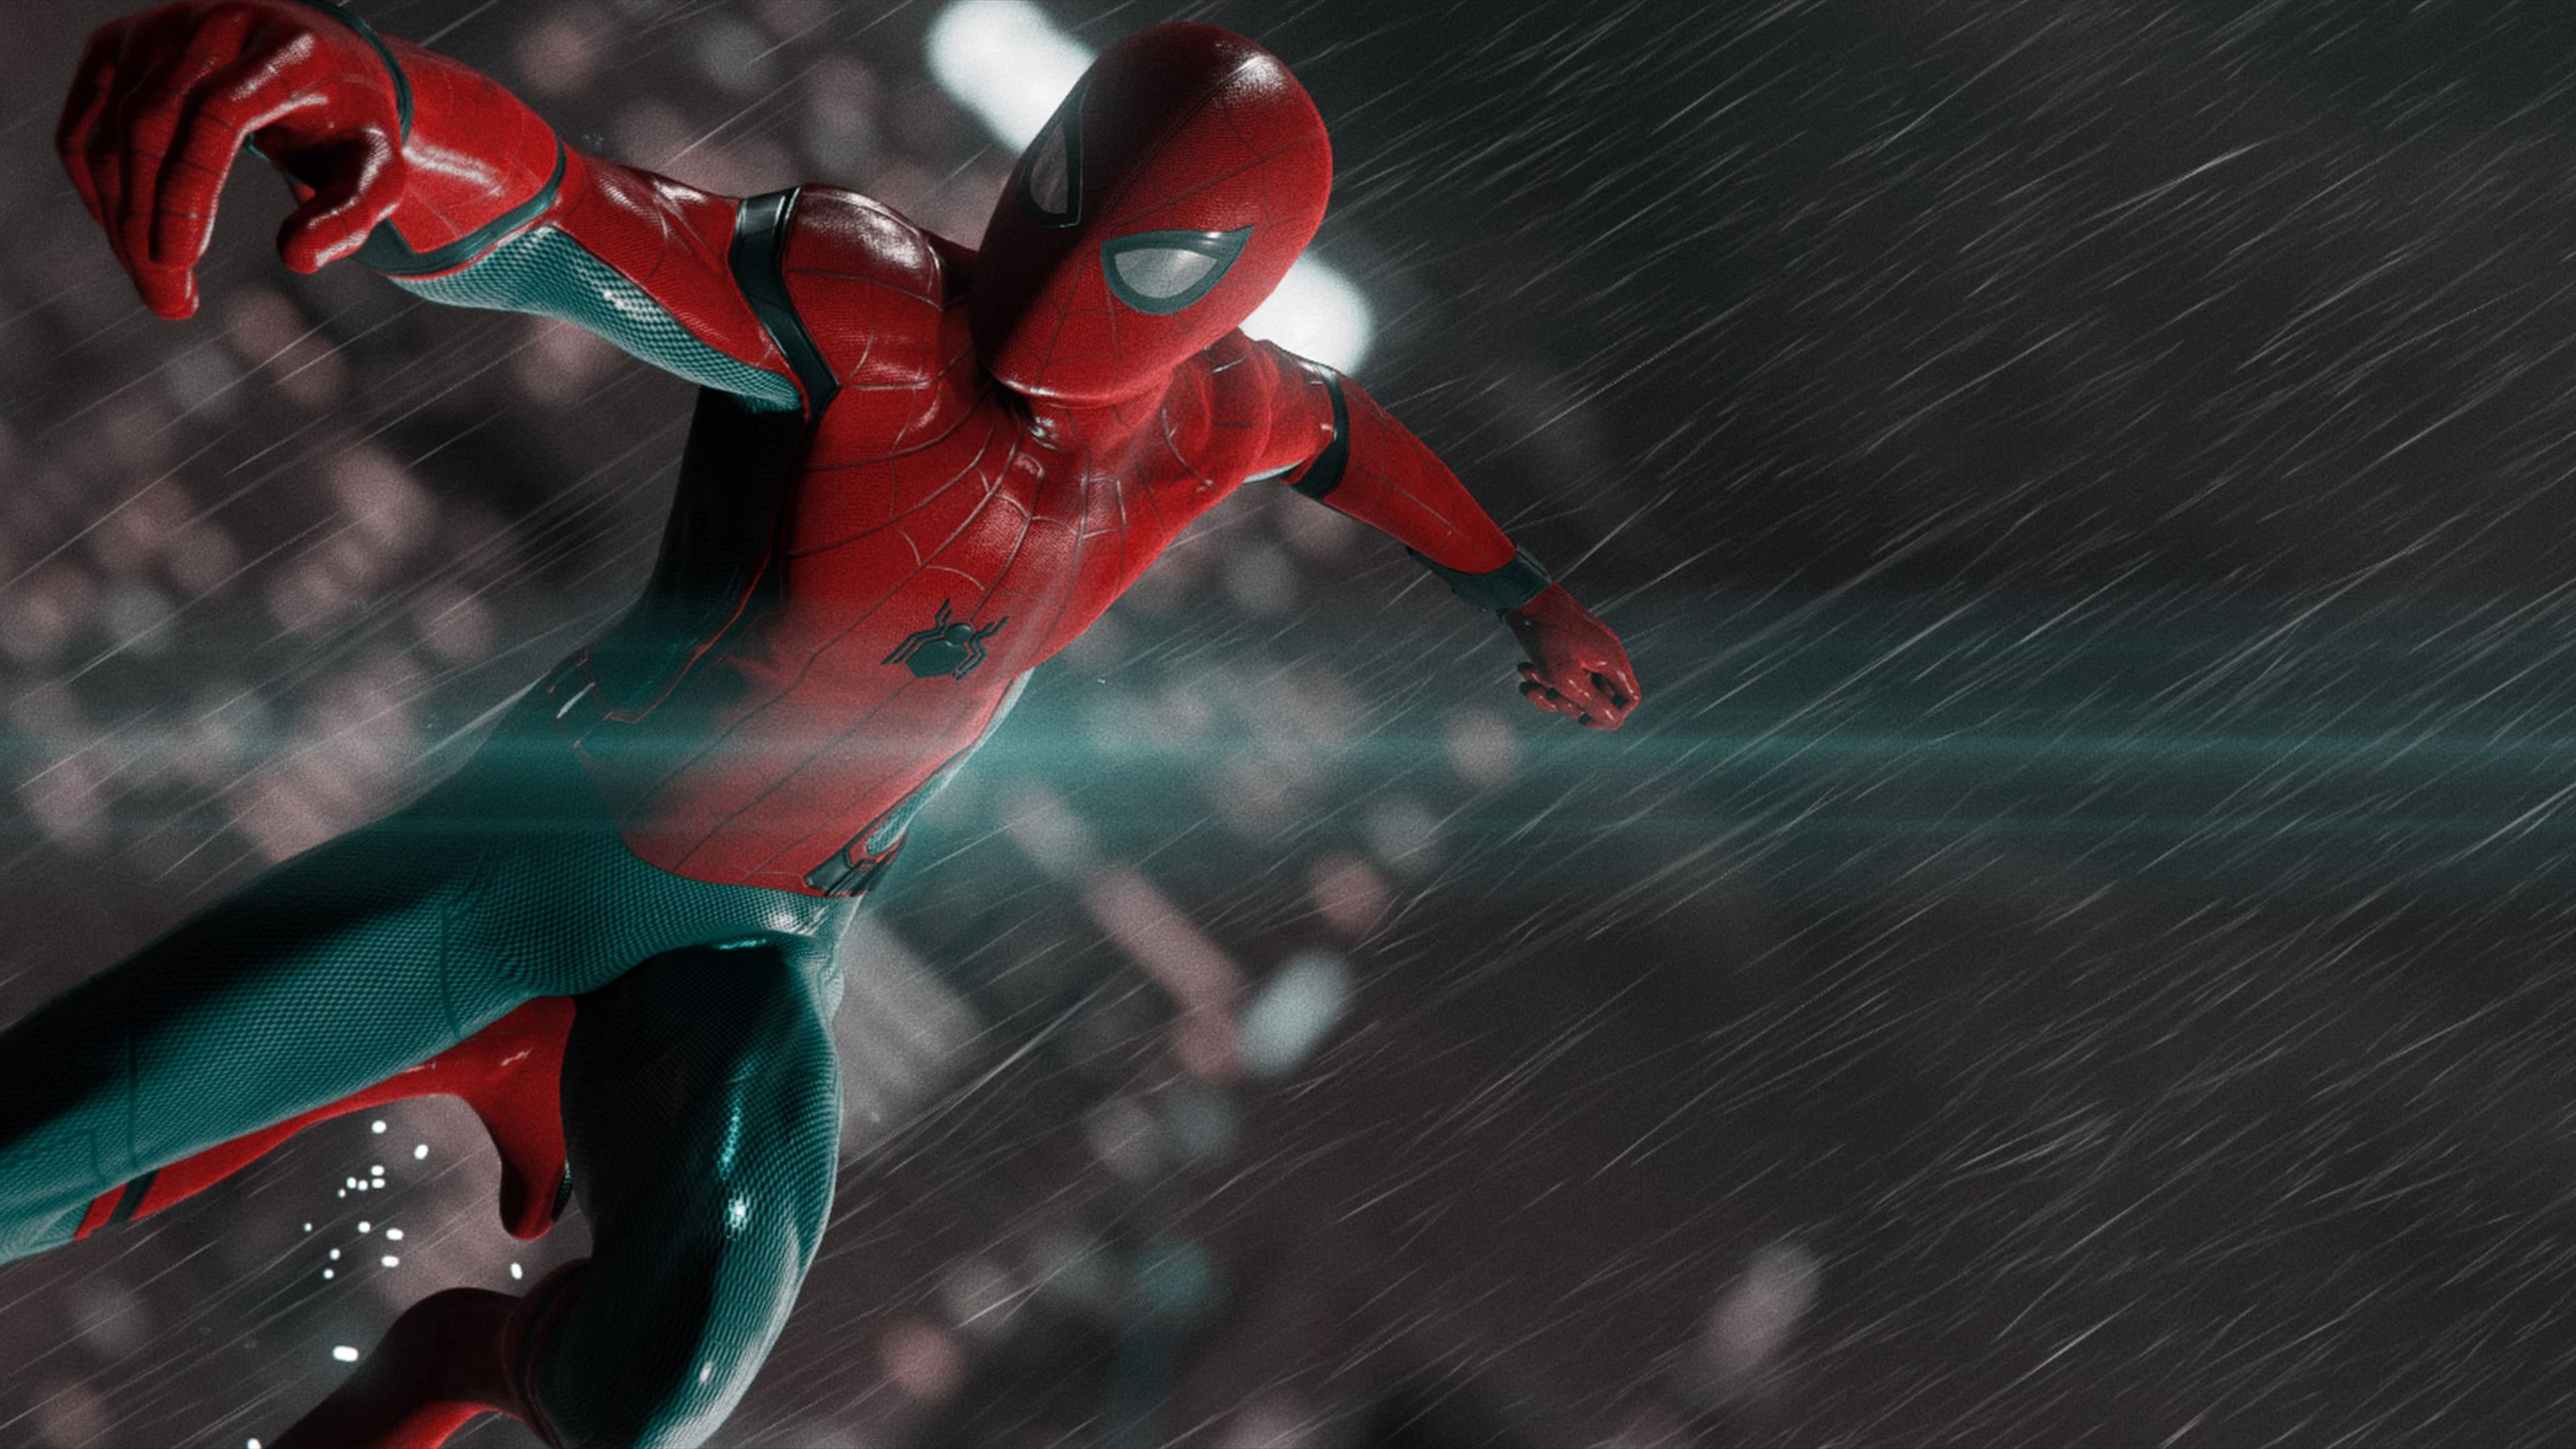 Wallpaper 4k Spiderman In The Rain 4k 4kwallpapers, hd